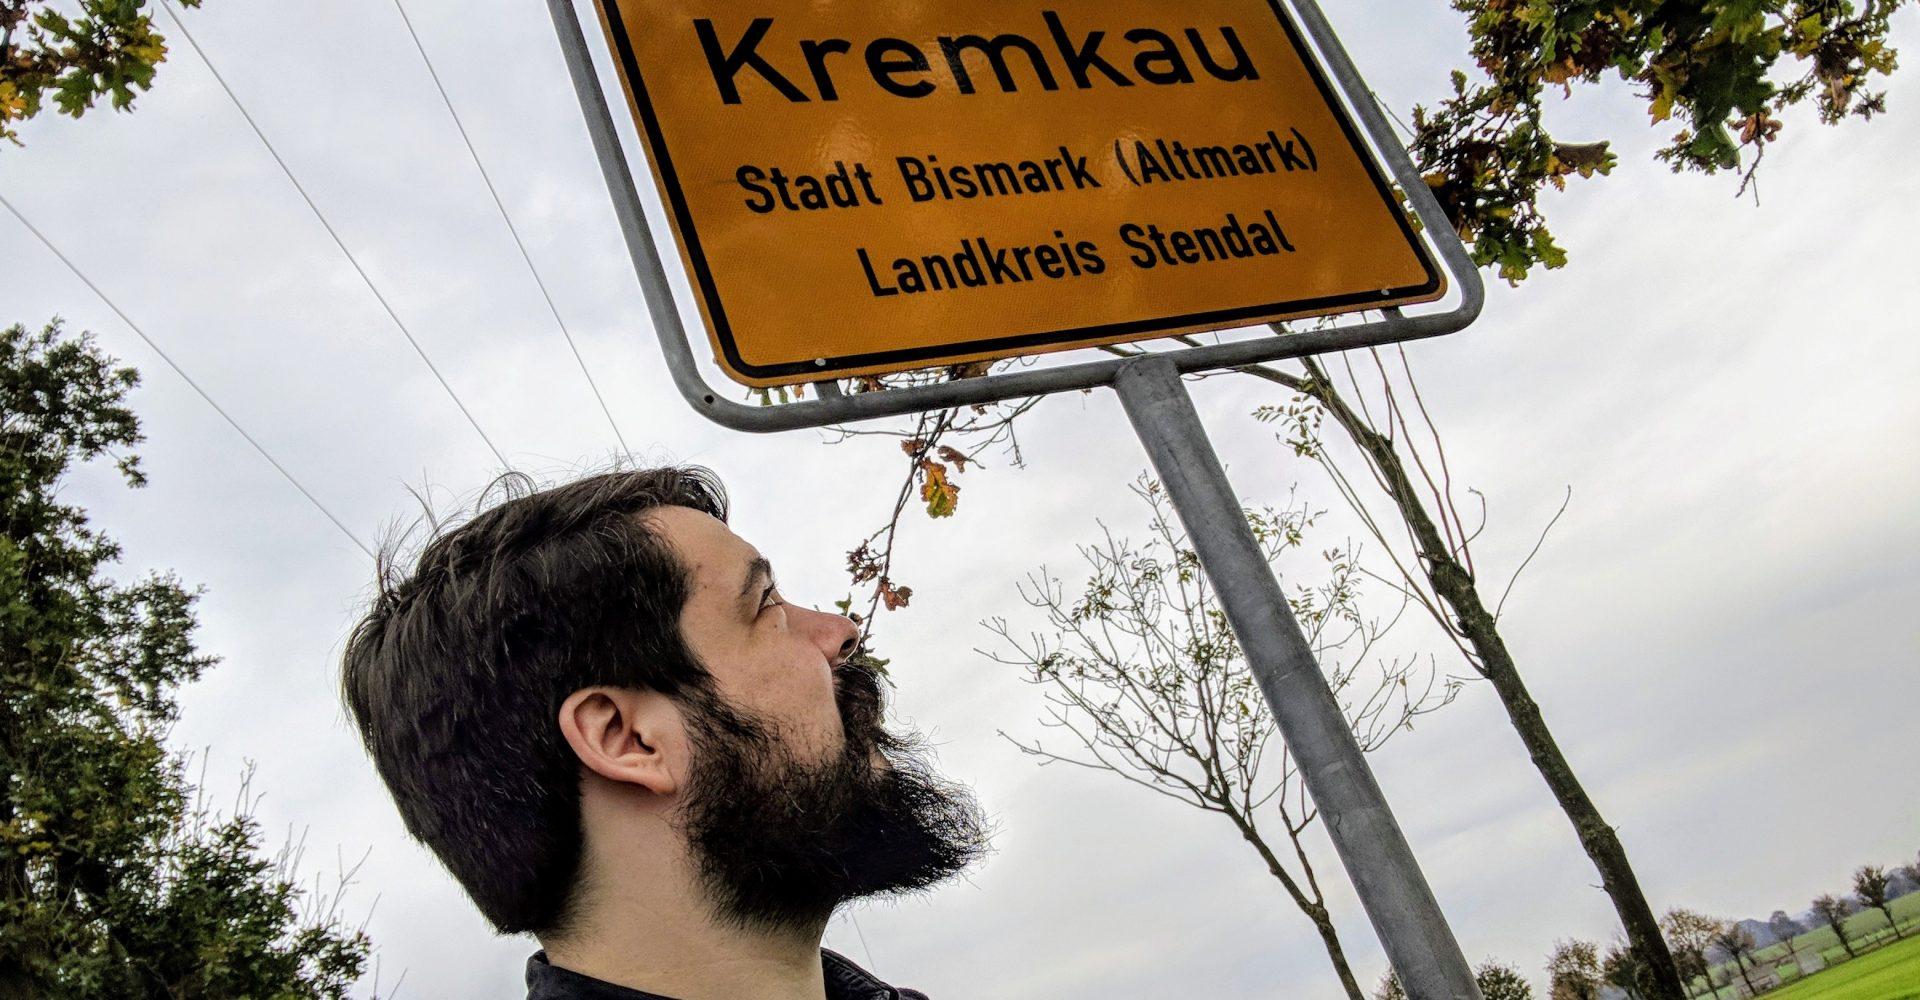 Tobias-Kremkau_in_Kremkau-Altmark(1)